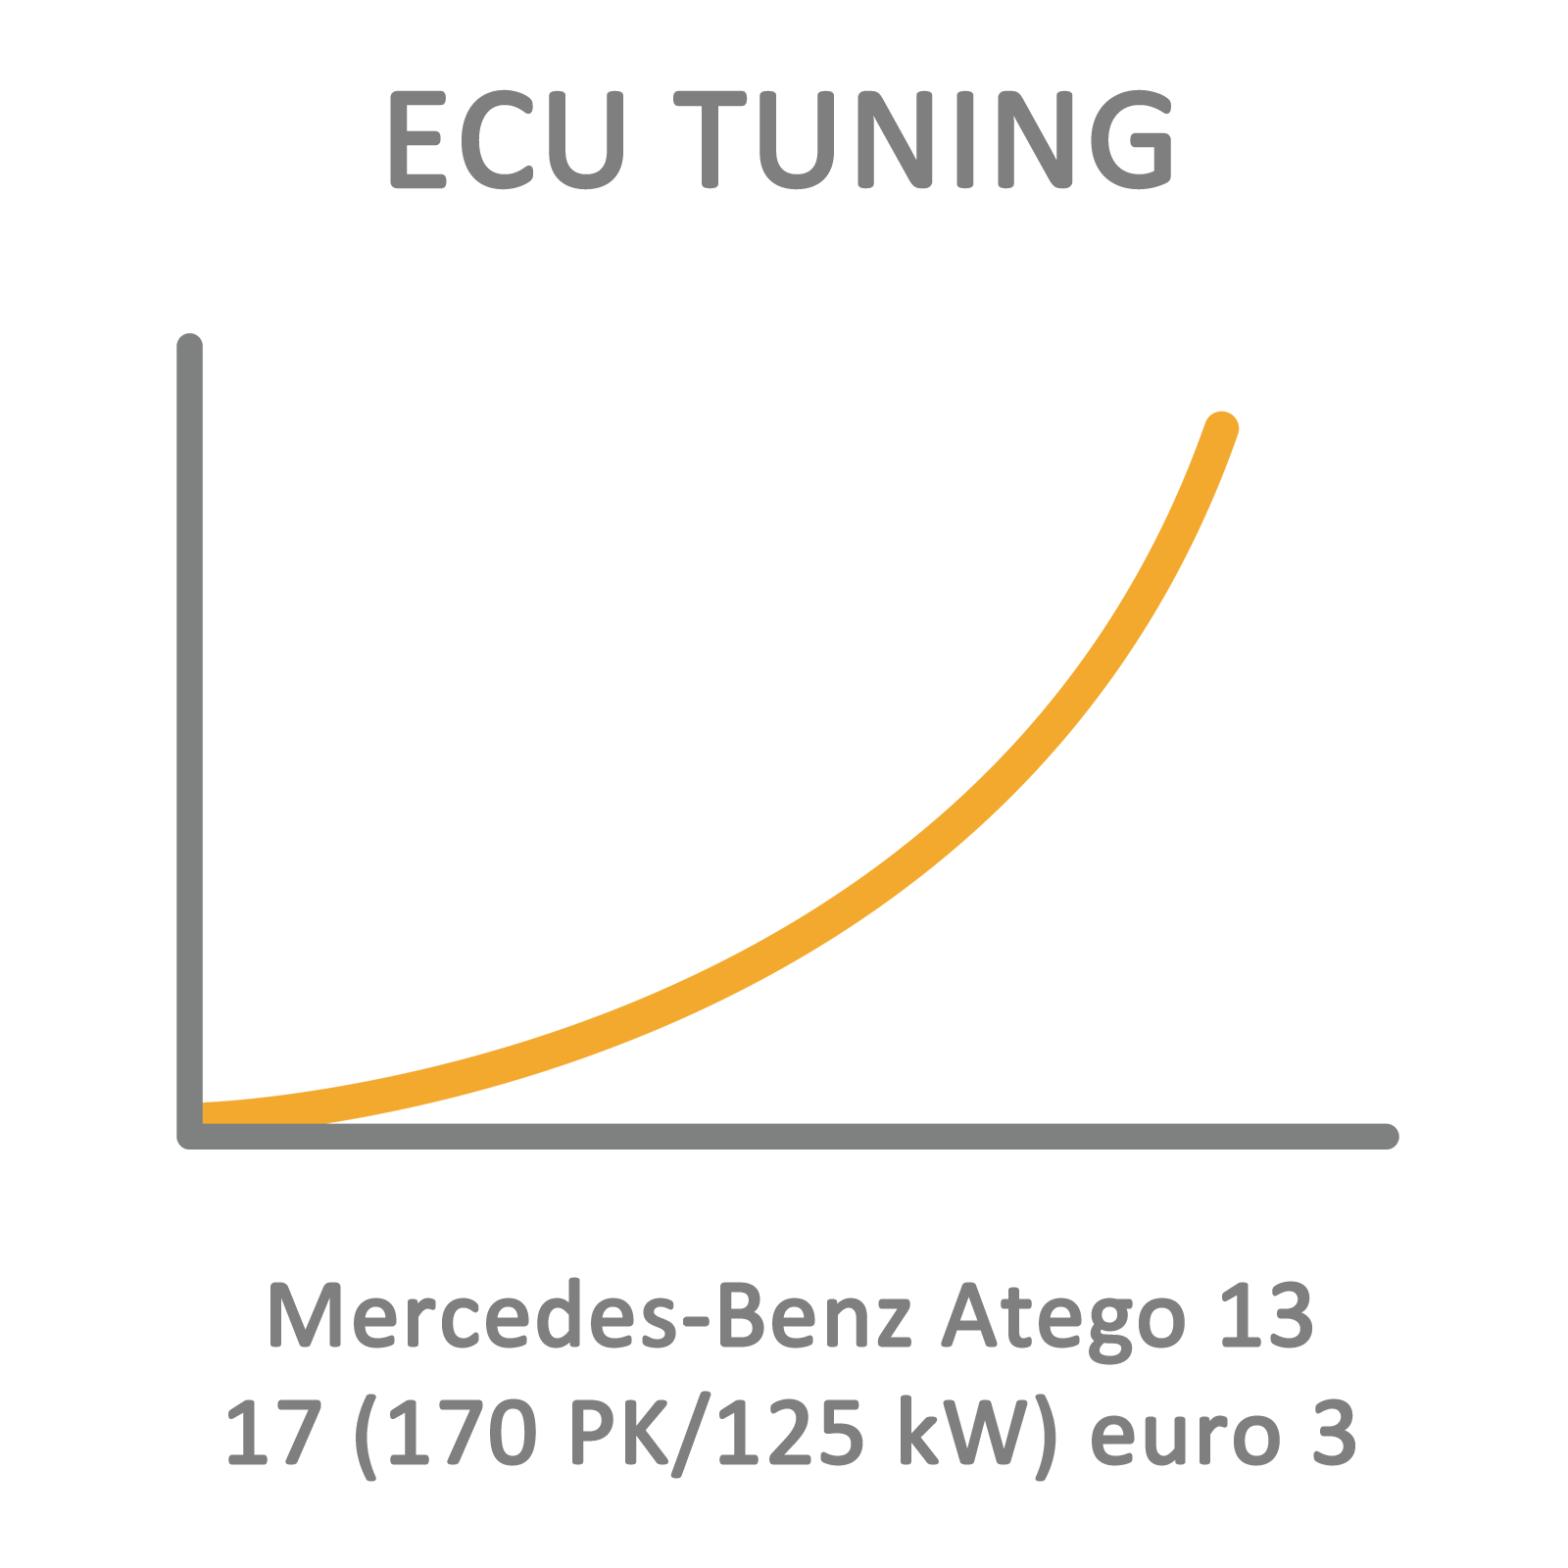 Mercedes-Benz Atego 13 17 (170 PK/125 kW) euro 3 ECU